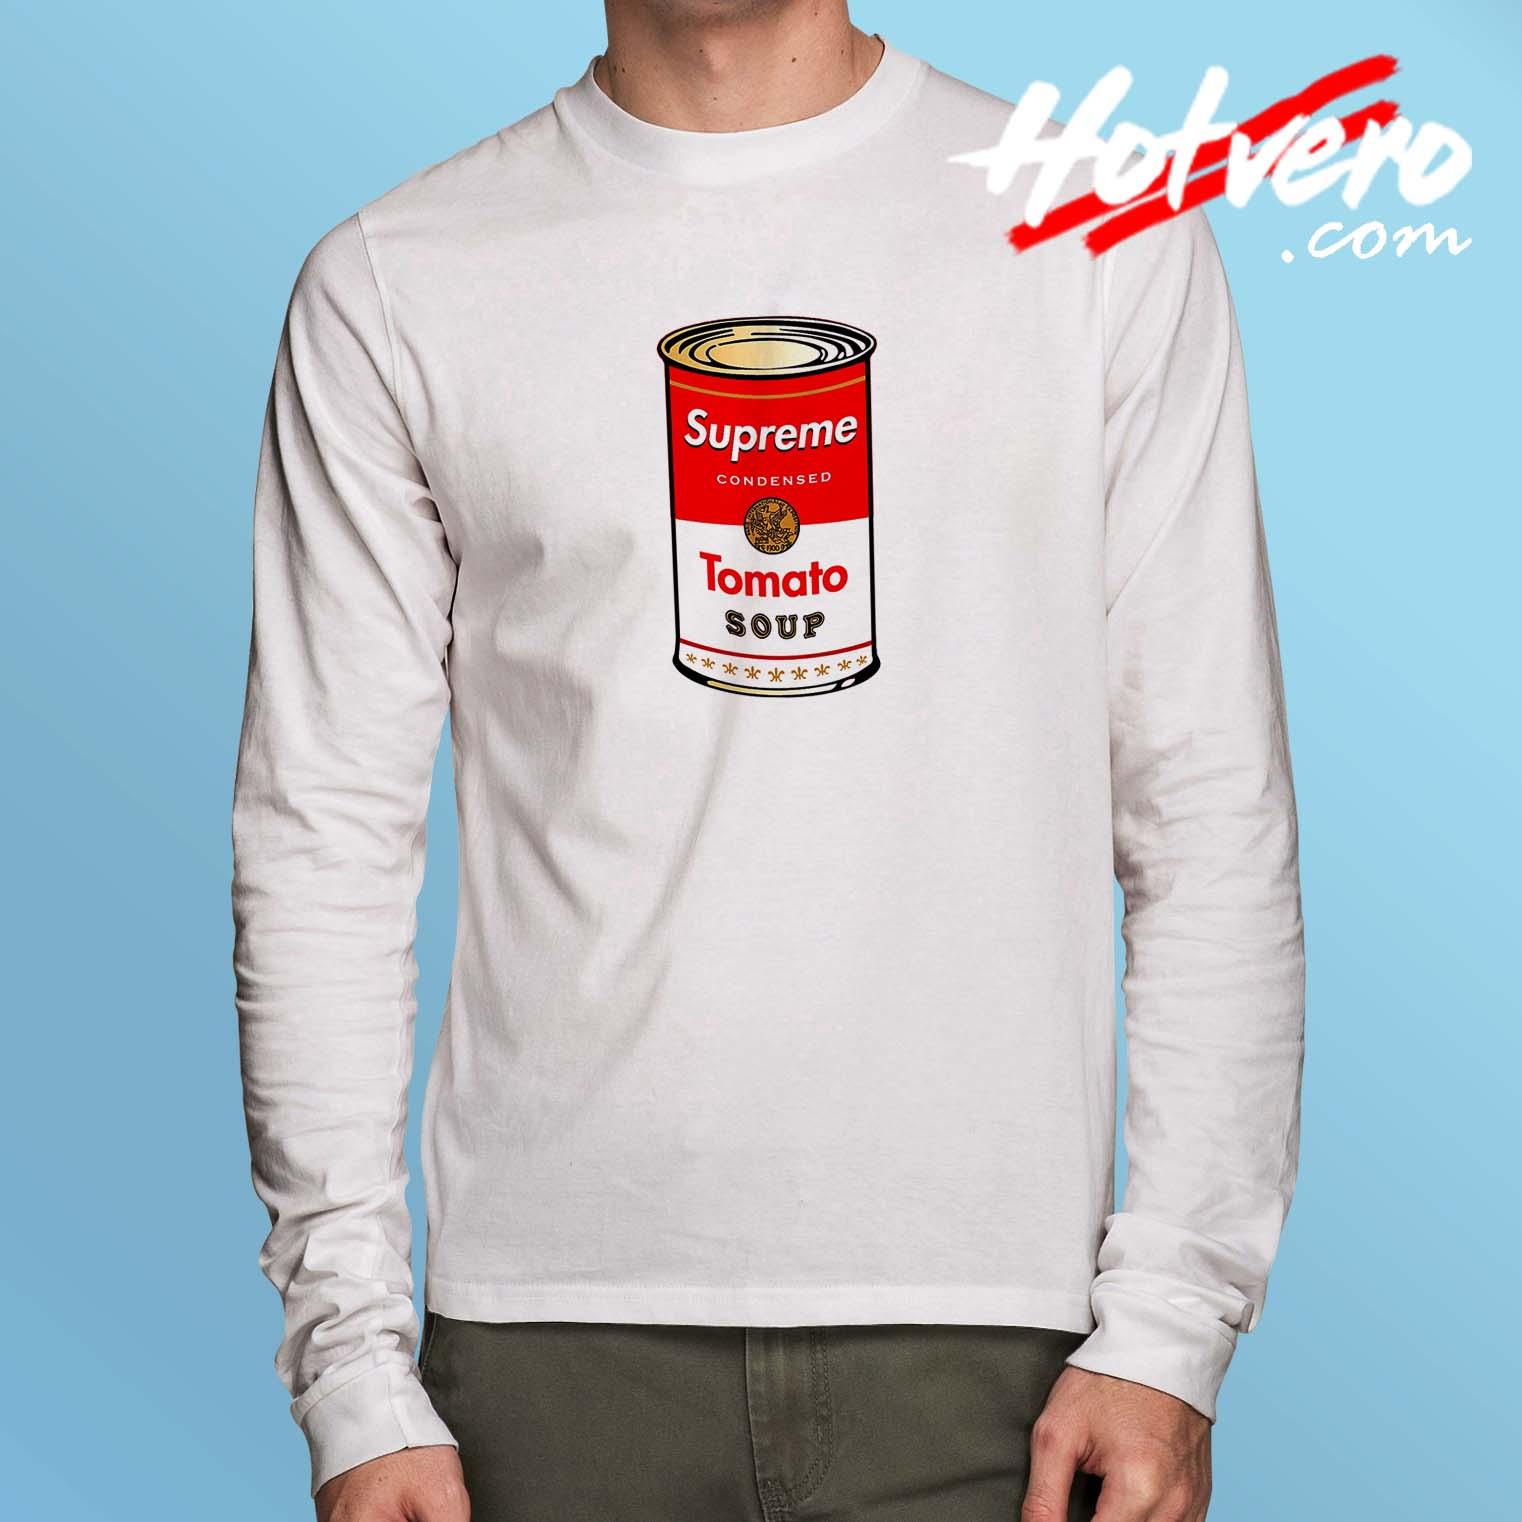 Cheap Supreme Tomato Soup Long Sleeve Shirt